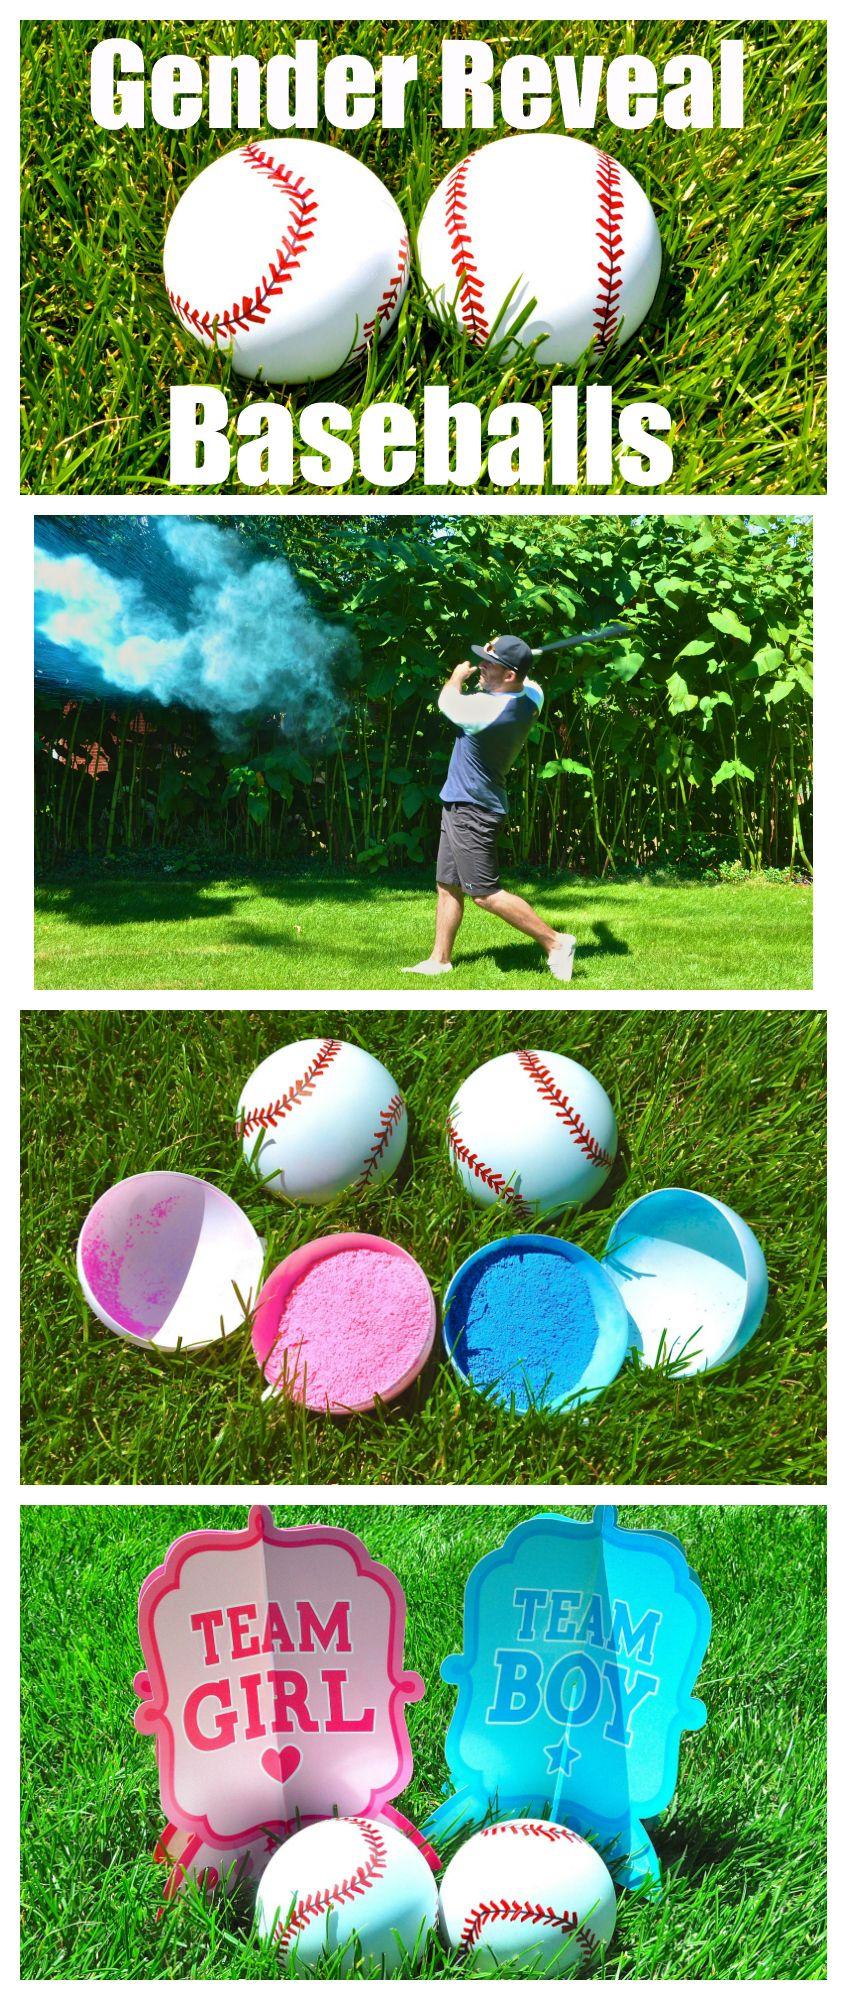 Gender Reveal Baseballs Such A Cute Gender Reveal Idea